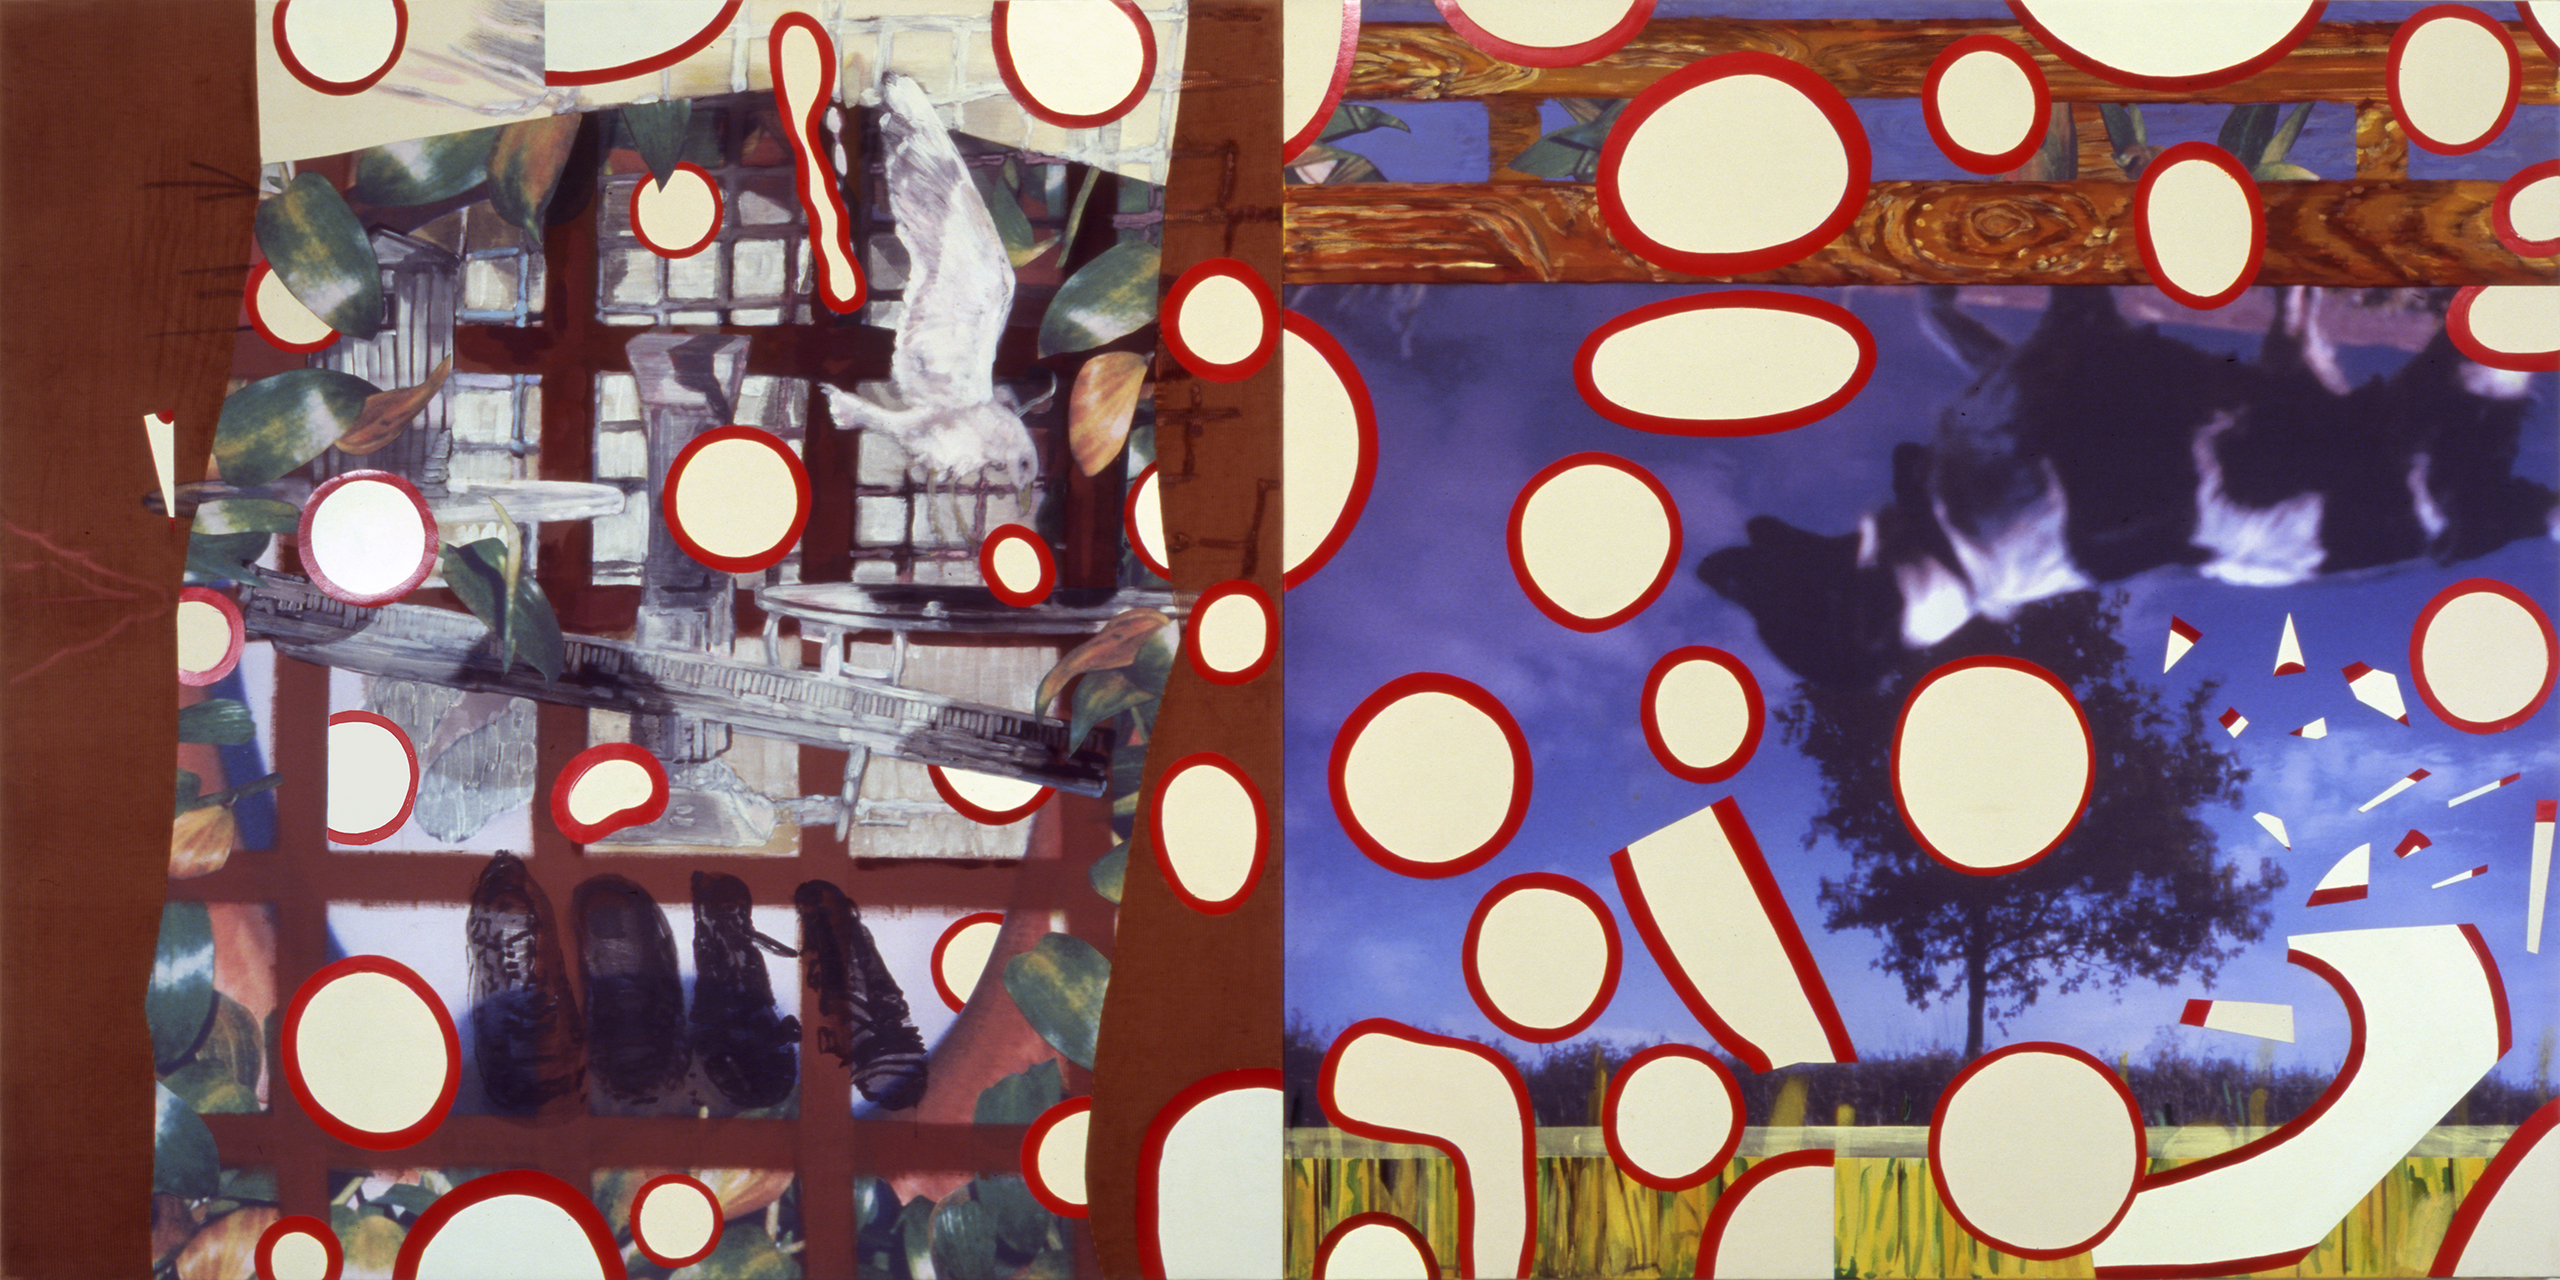 12_Robert_Smit_Flipping_in_the_Betuwe_2004_acrylic_tempera_oil_collage_corduroy_canvas_200x400cm_1280_hoog